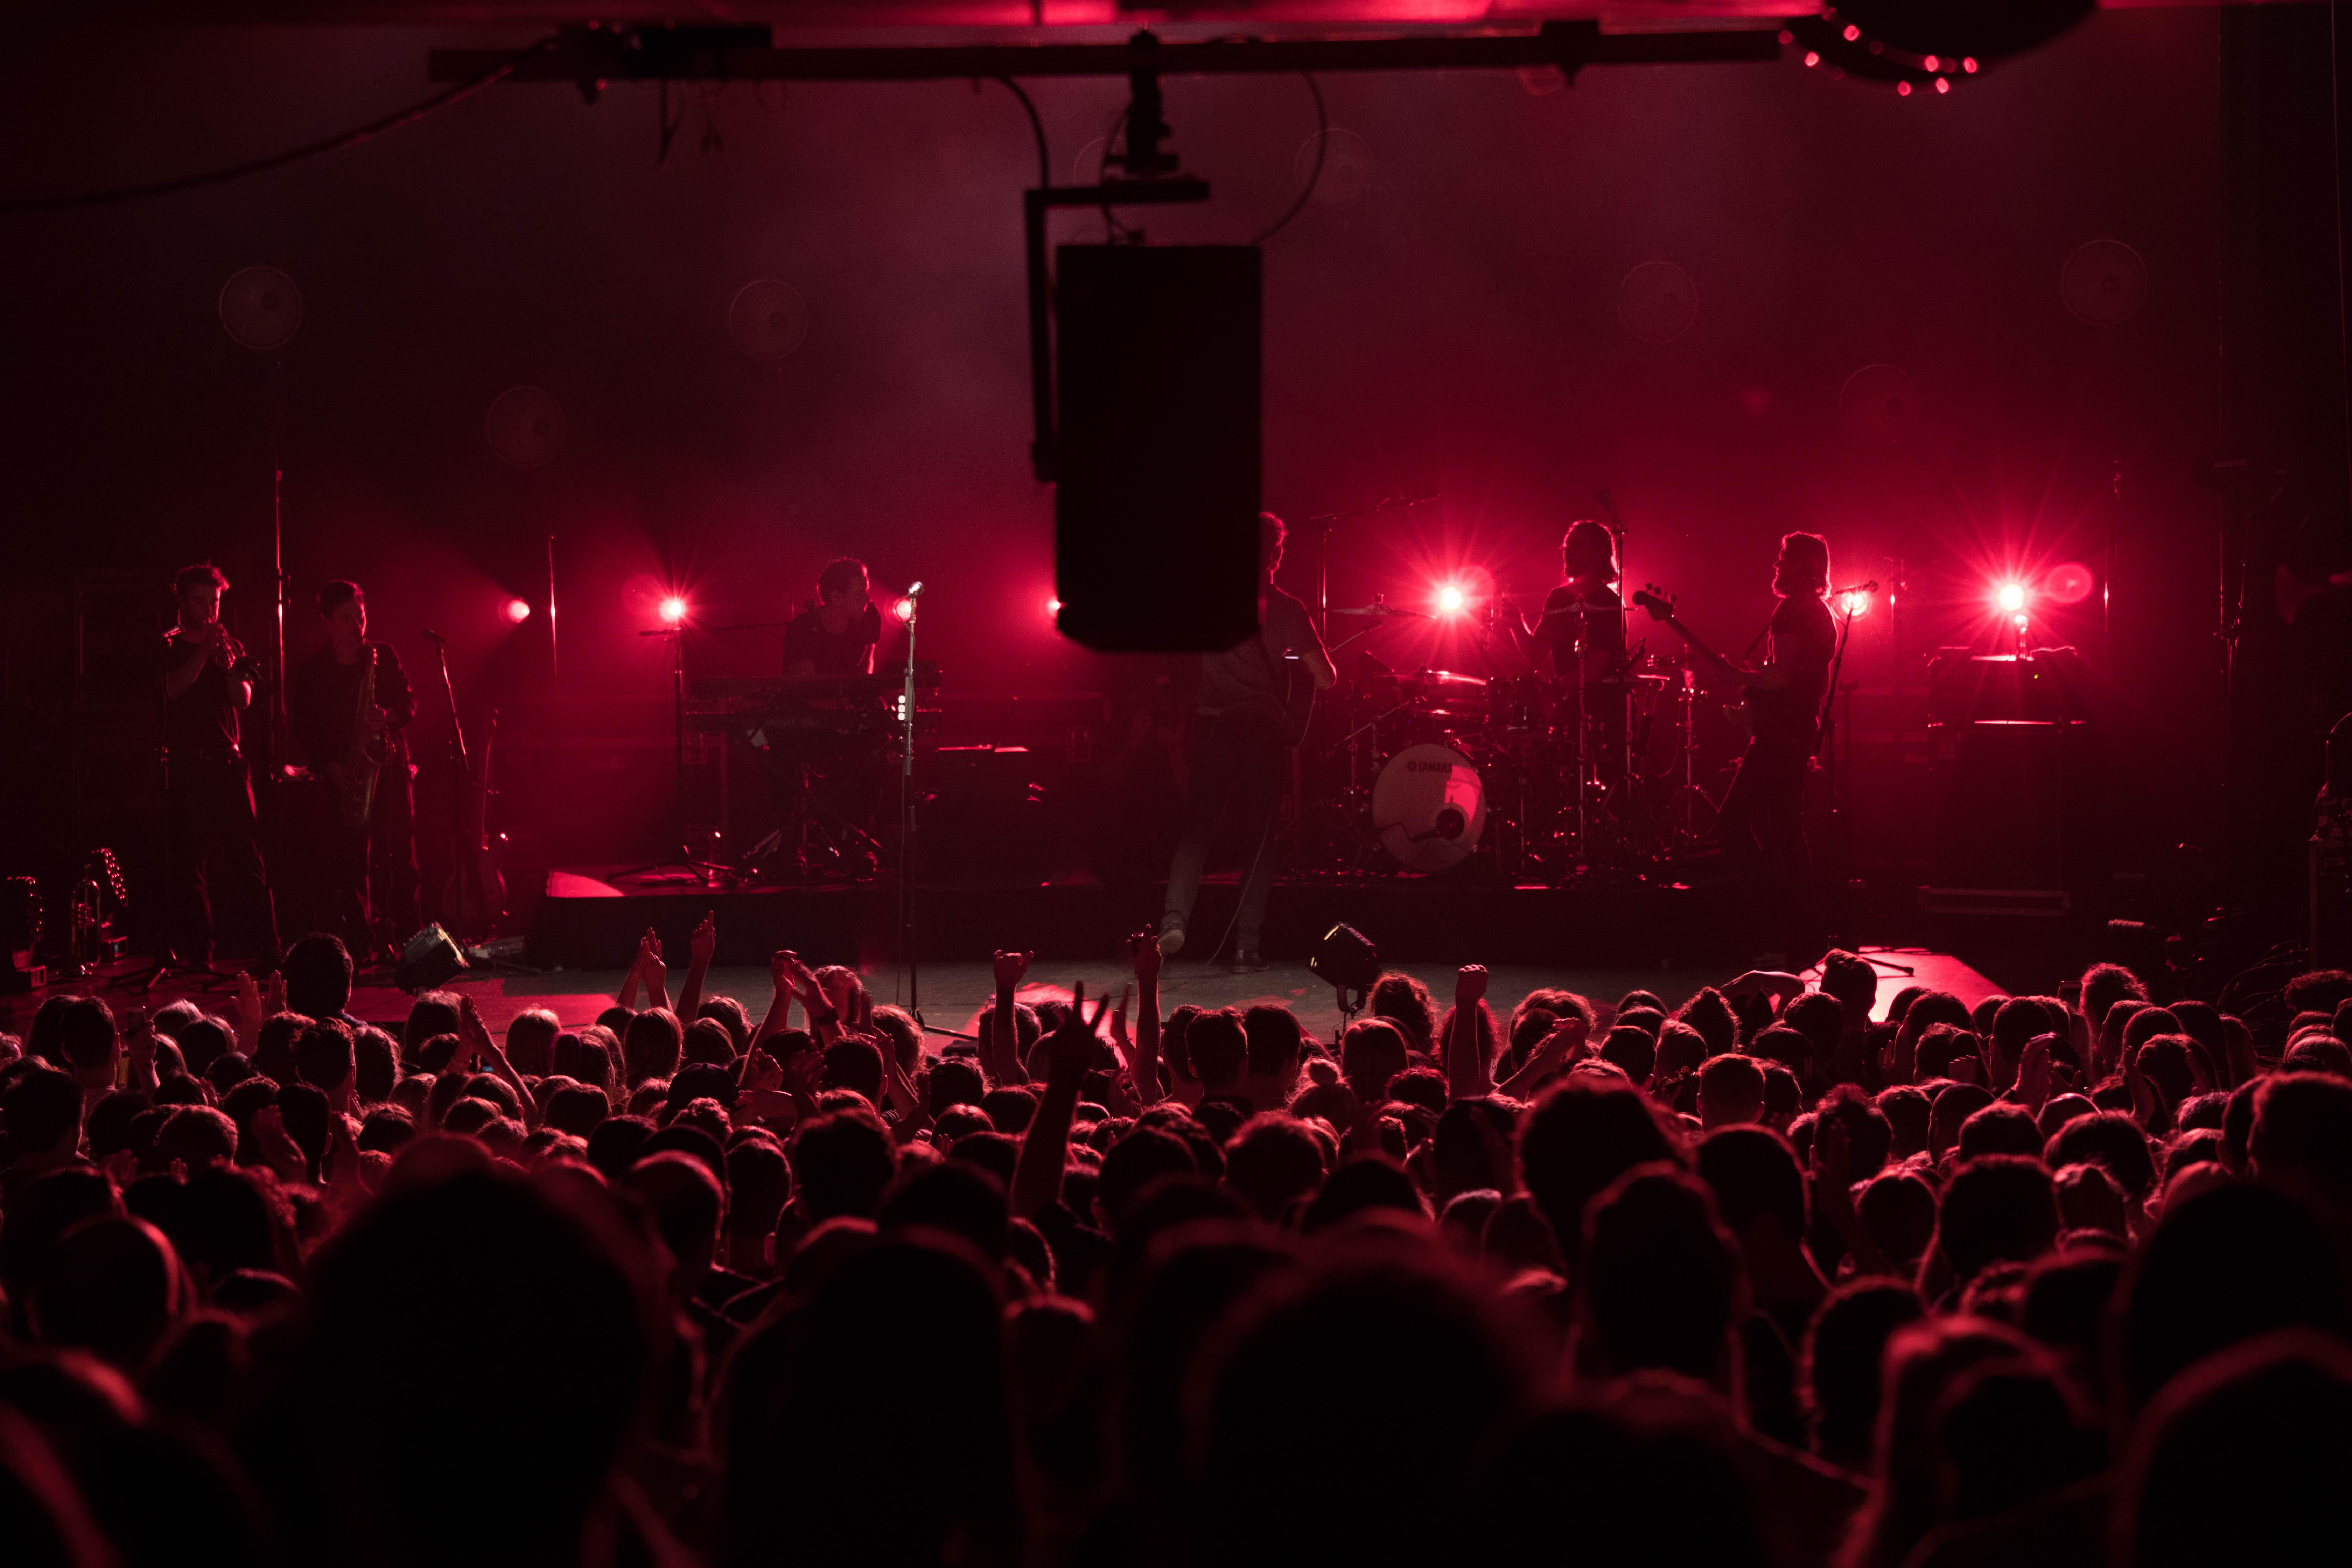 vance joy live review sydney photo credit statler willand savage thrills savagethrills 5